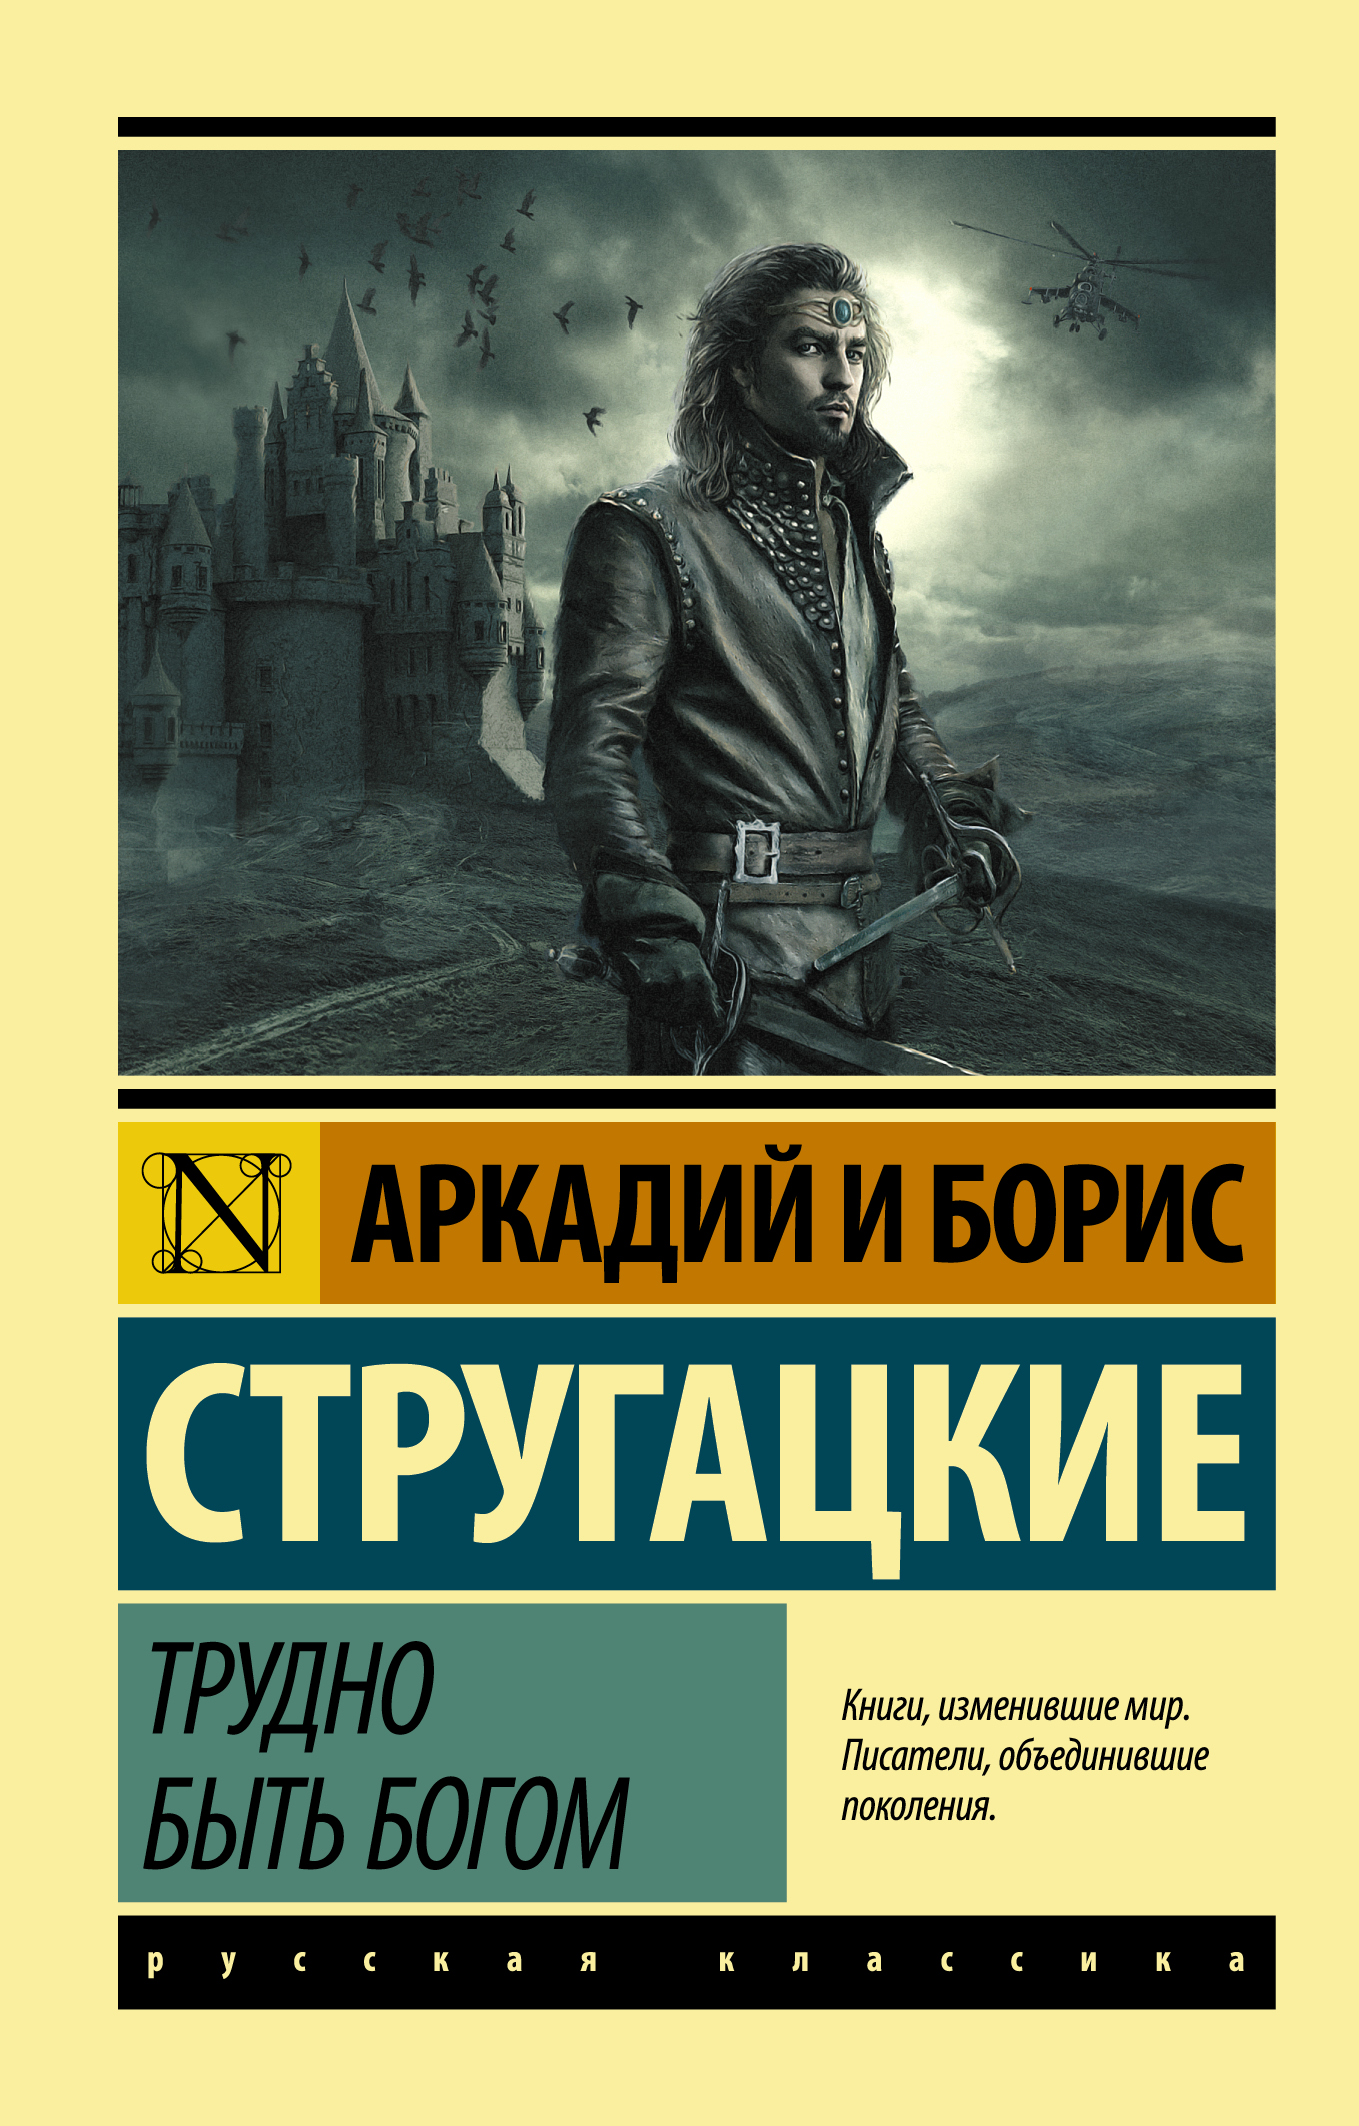 Аркадий Стругацкий, Борис Стругацкий Трудно быть богом